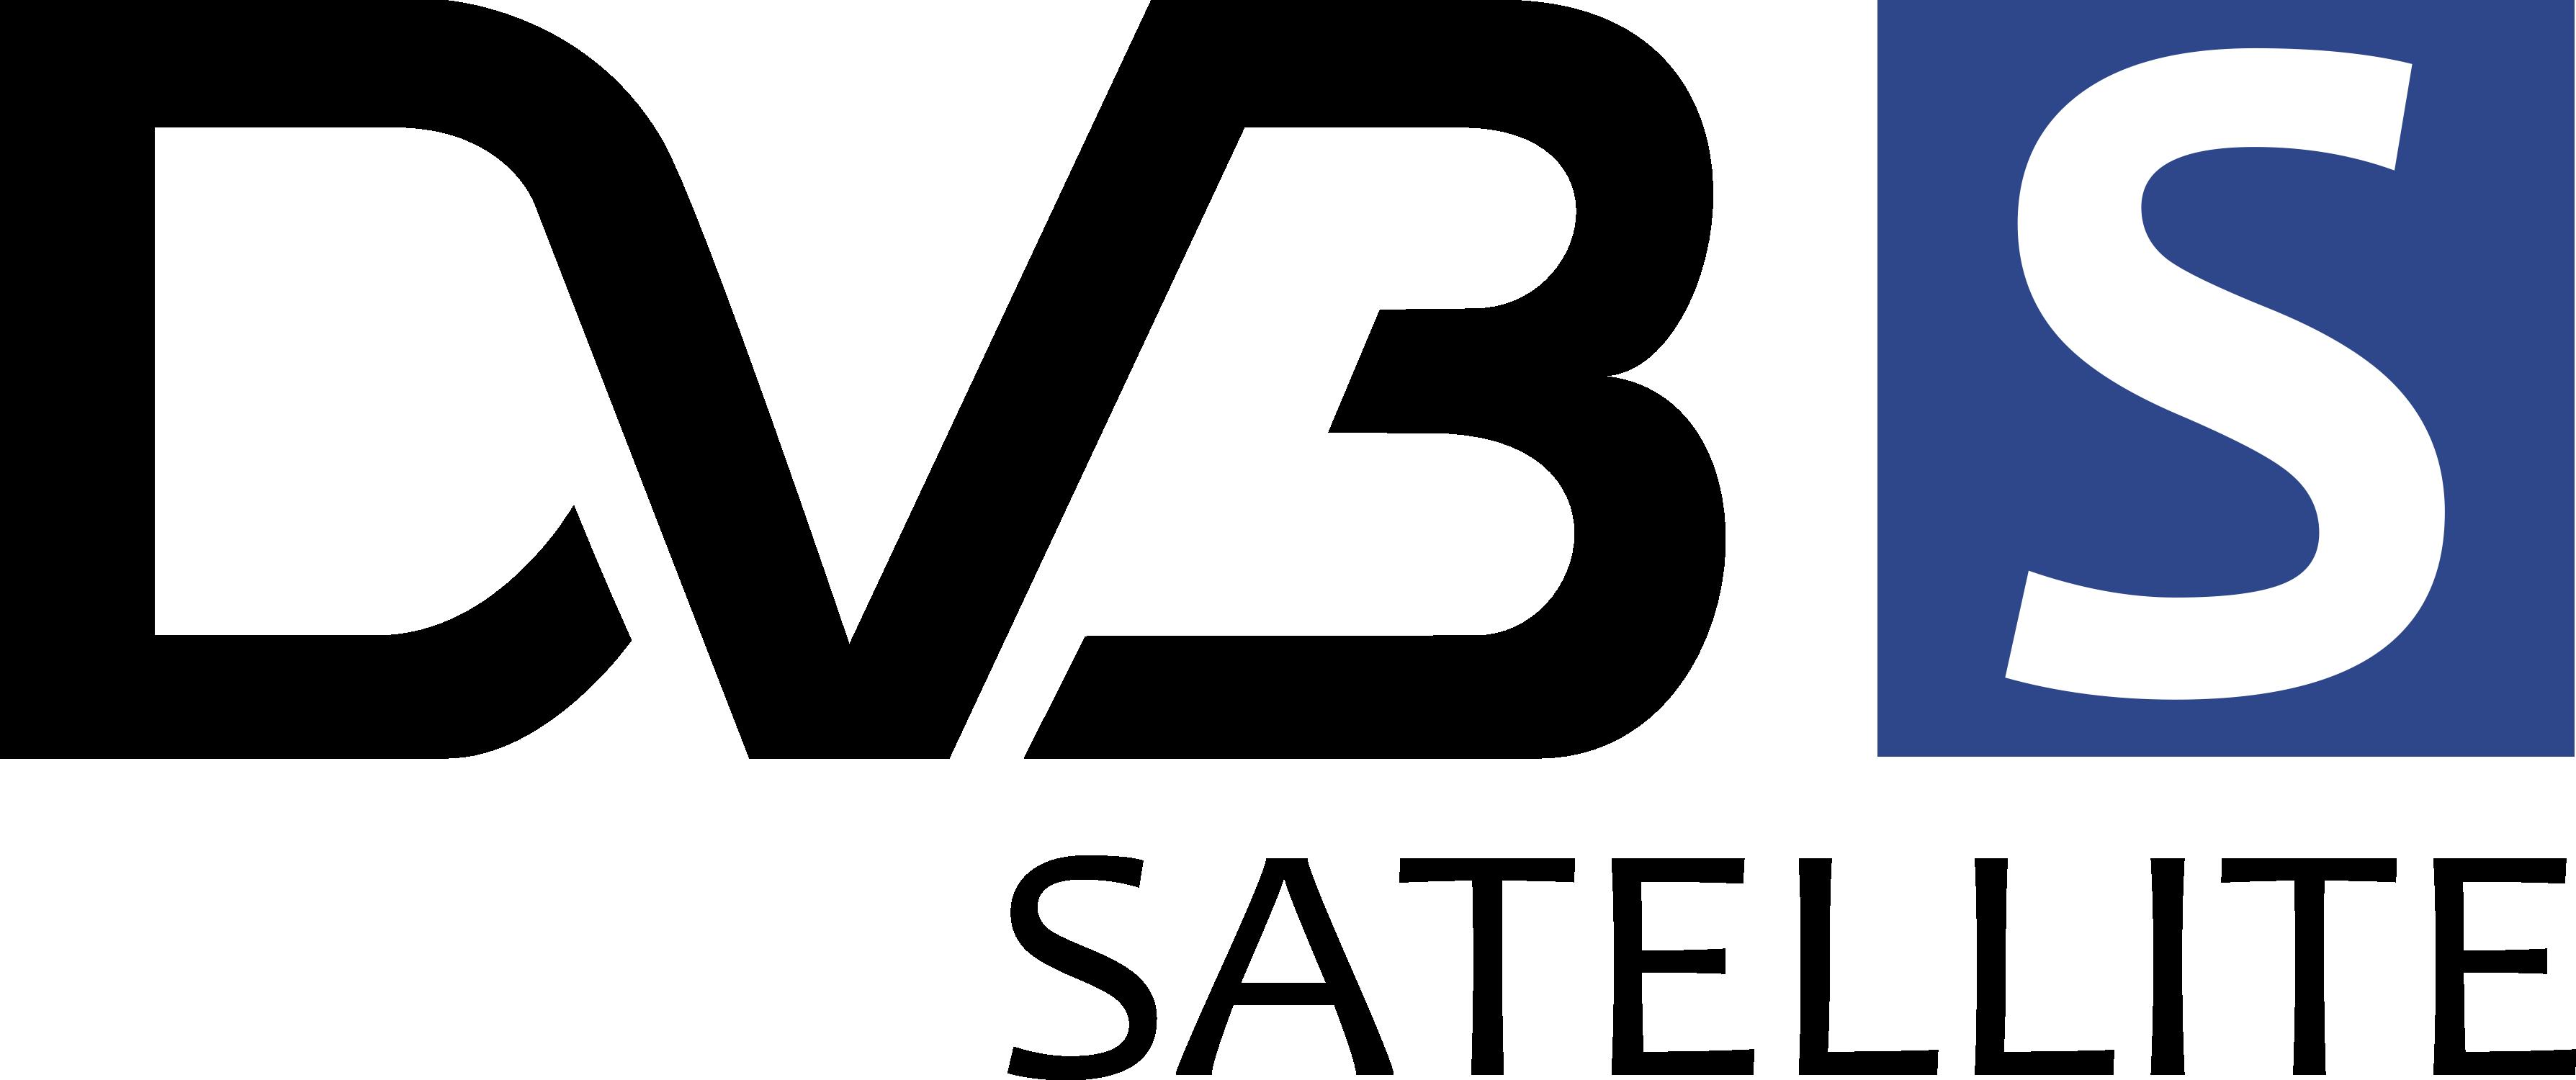 DVB-S-Logo